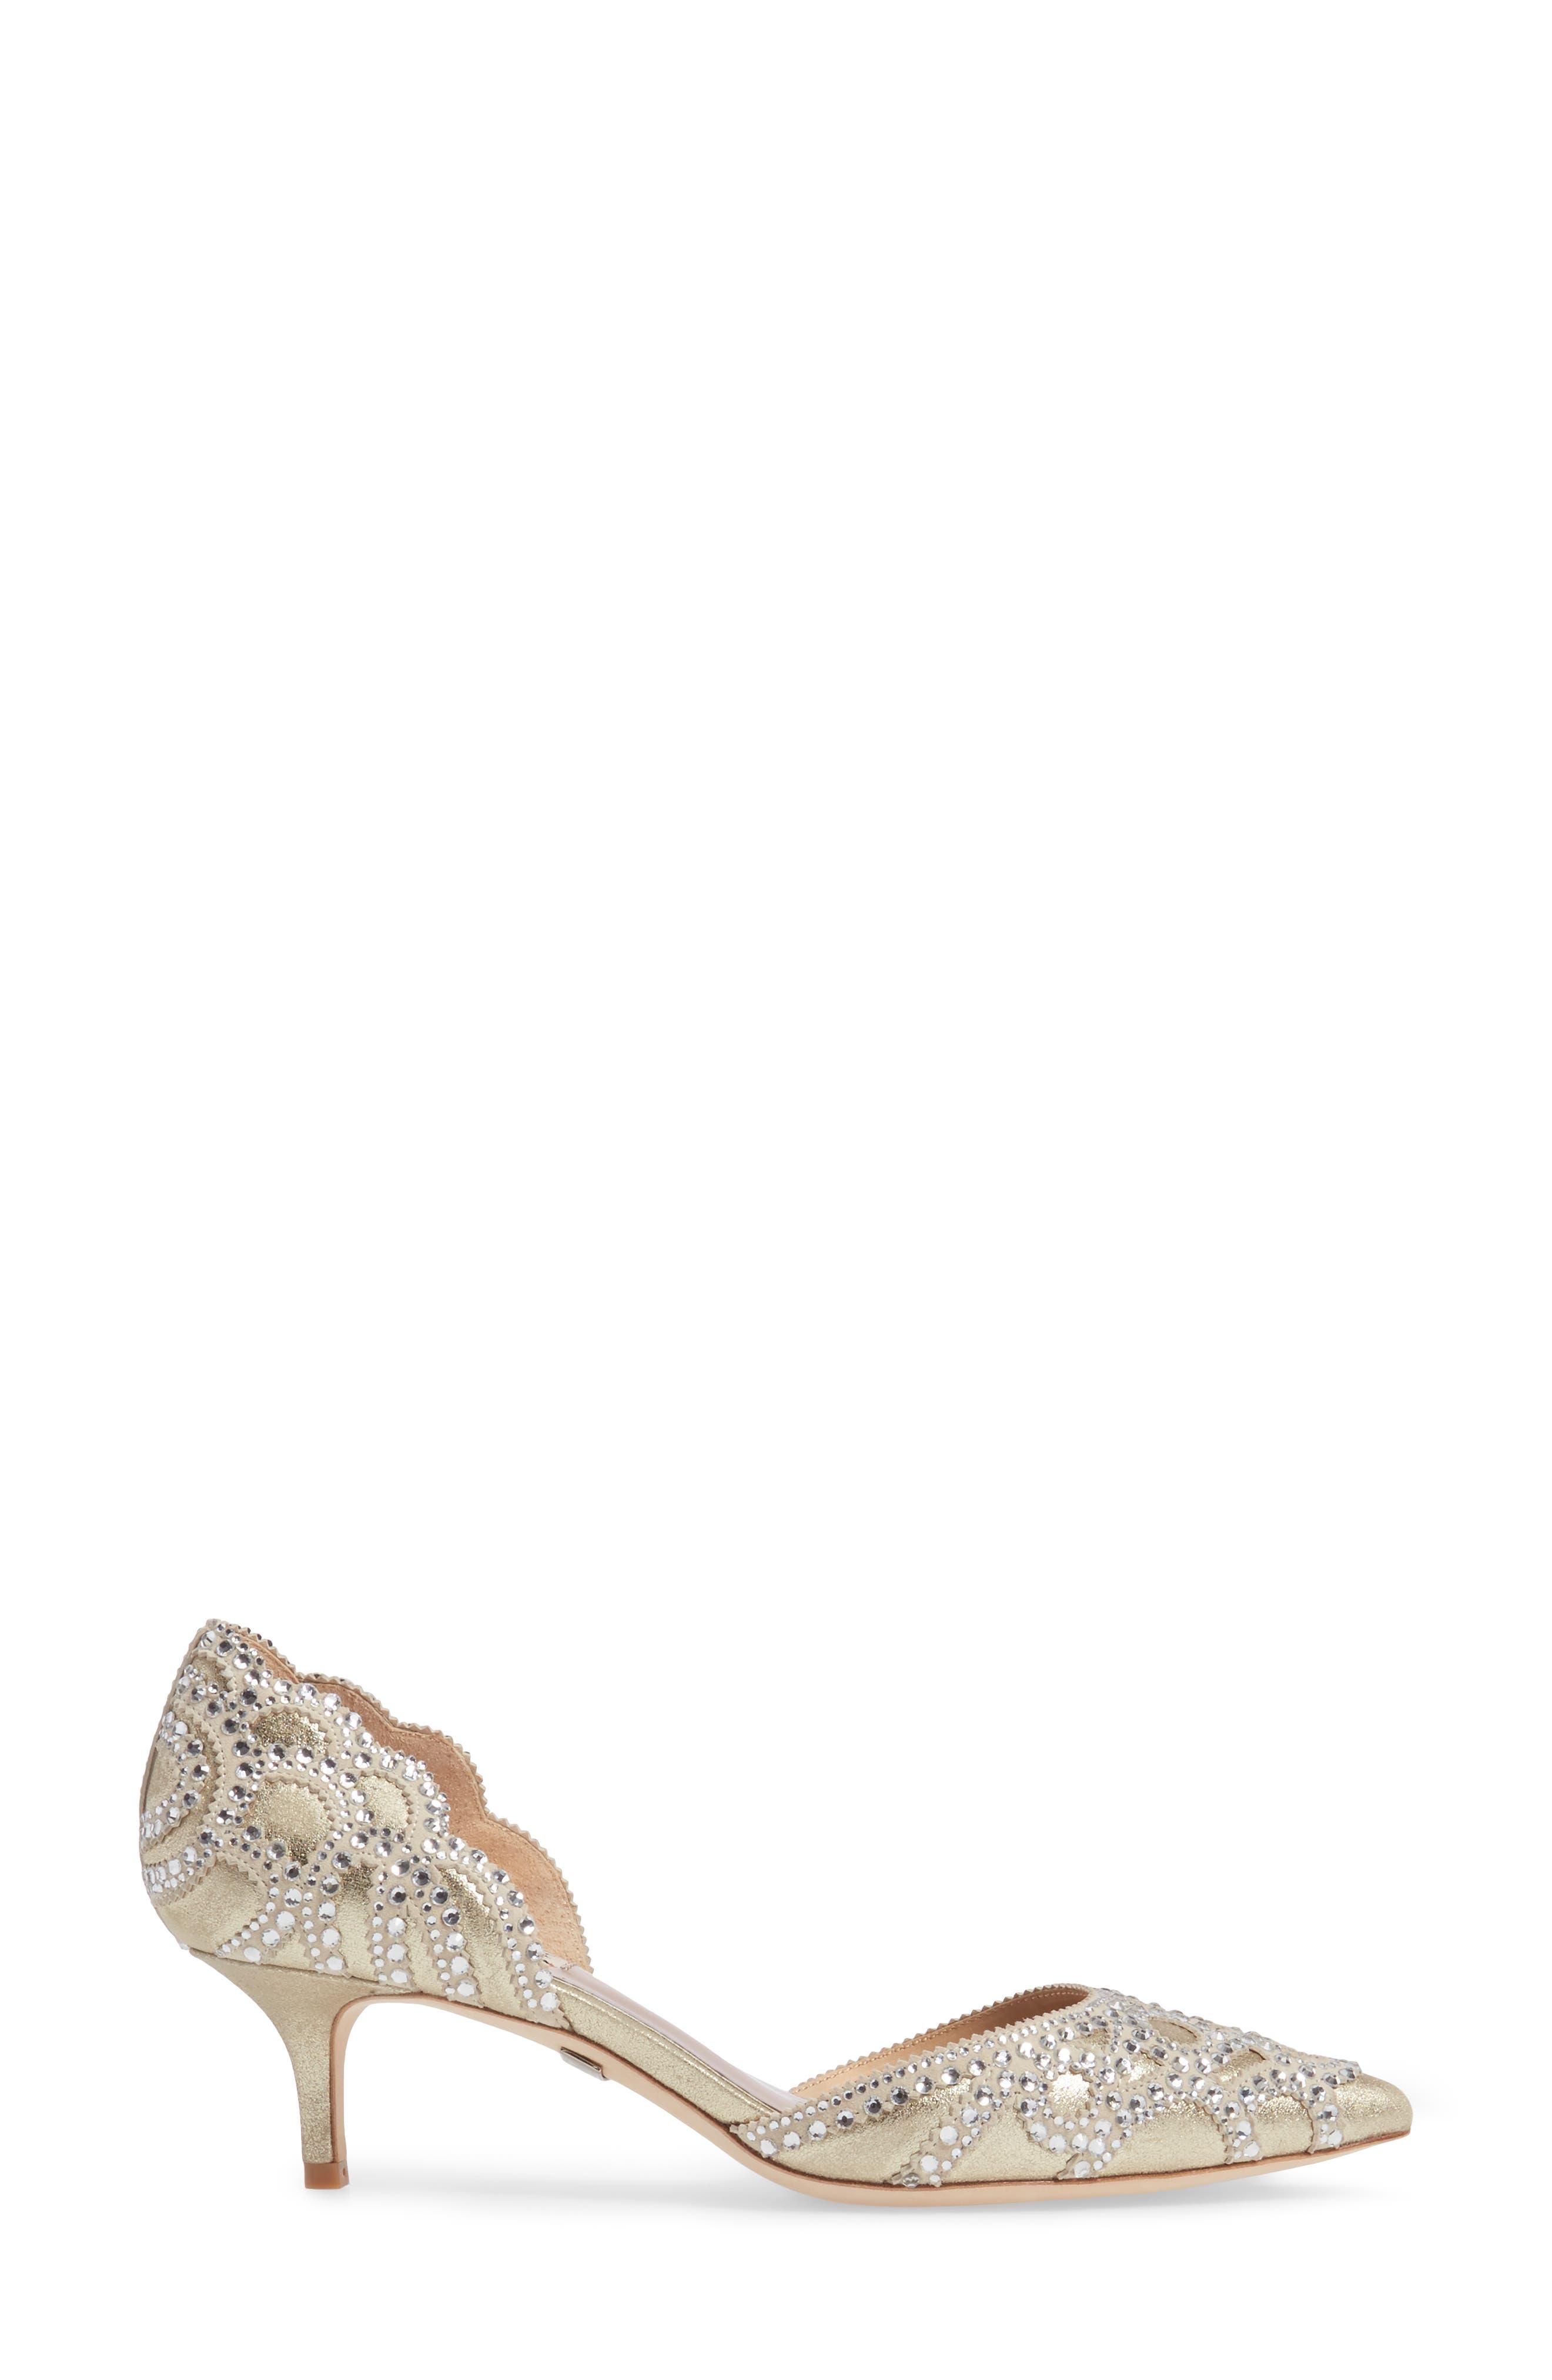 Alternate Image 3  - Badgley Mischka 'Ginny' Embellished d'Orsay Pump (Women)